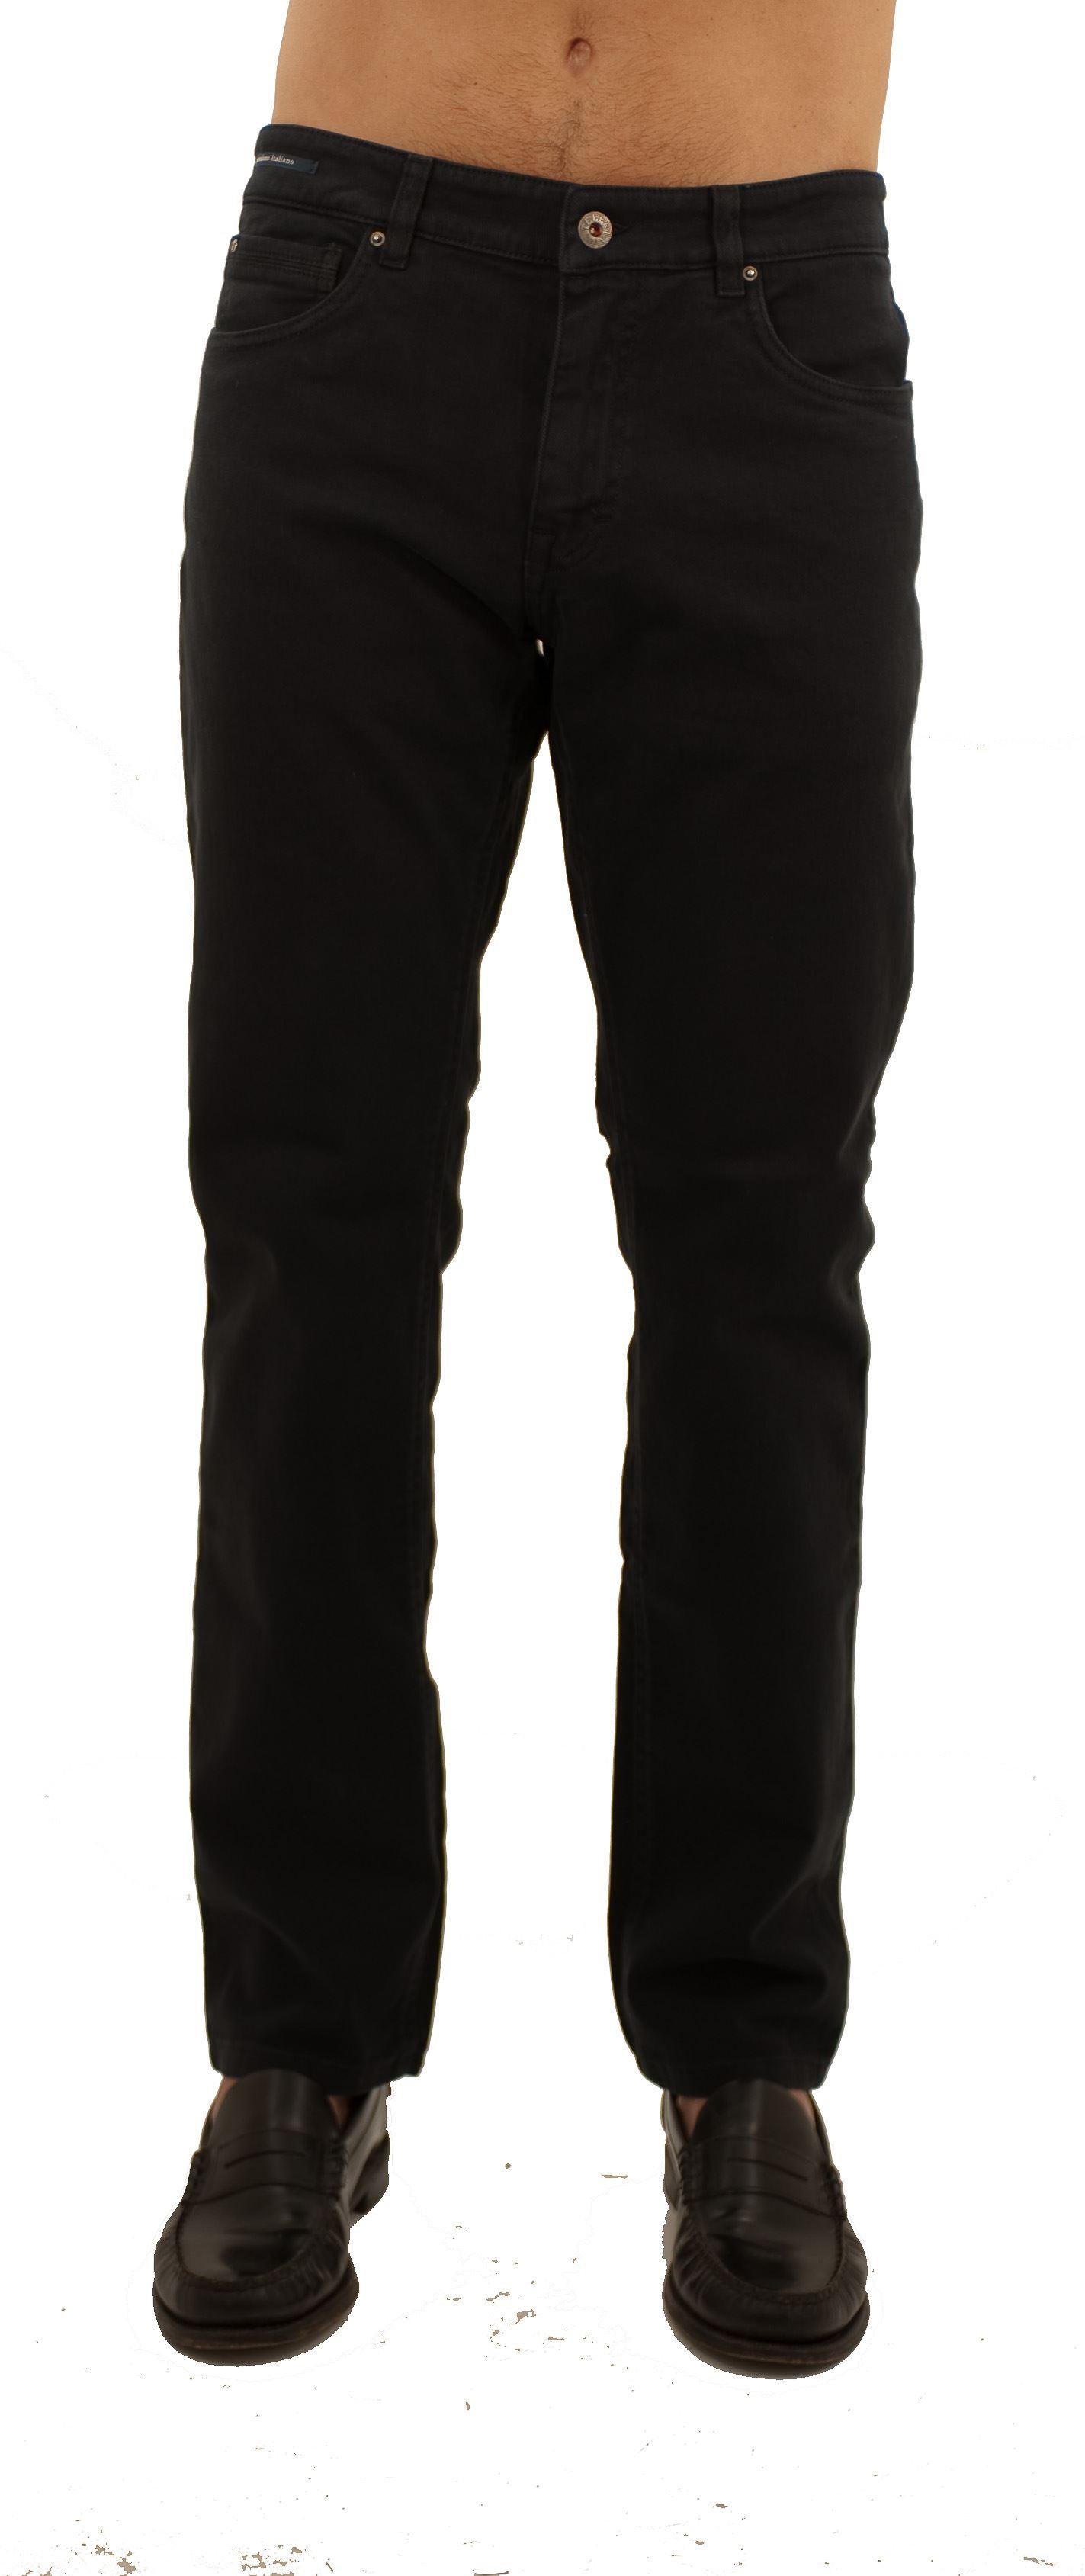 Immagine di Pantalone 5 tasche in gabardine di cotone